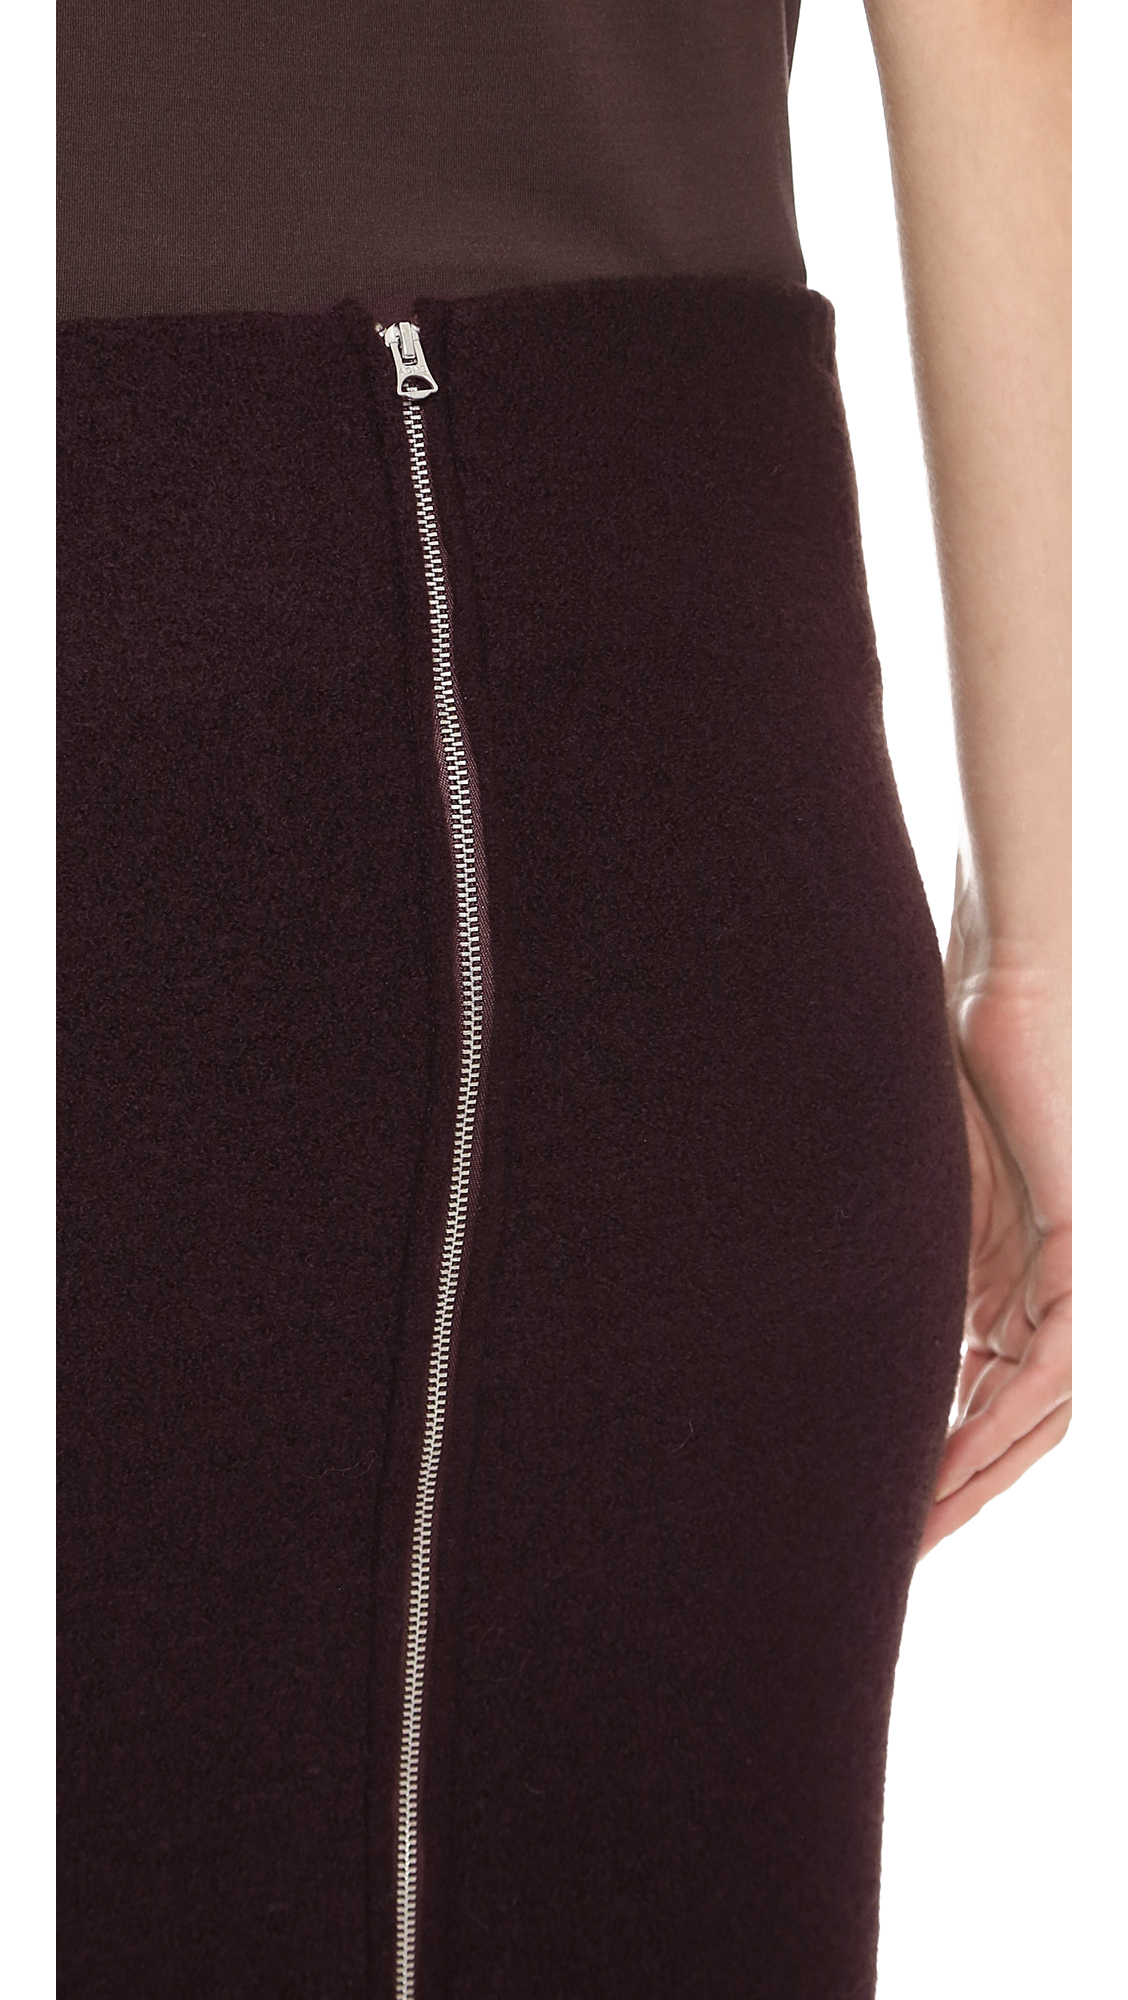 Acne Donna Boiled Wool Pencil Skirt Dark Brown in Brown   Lyst